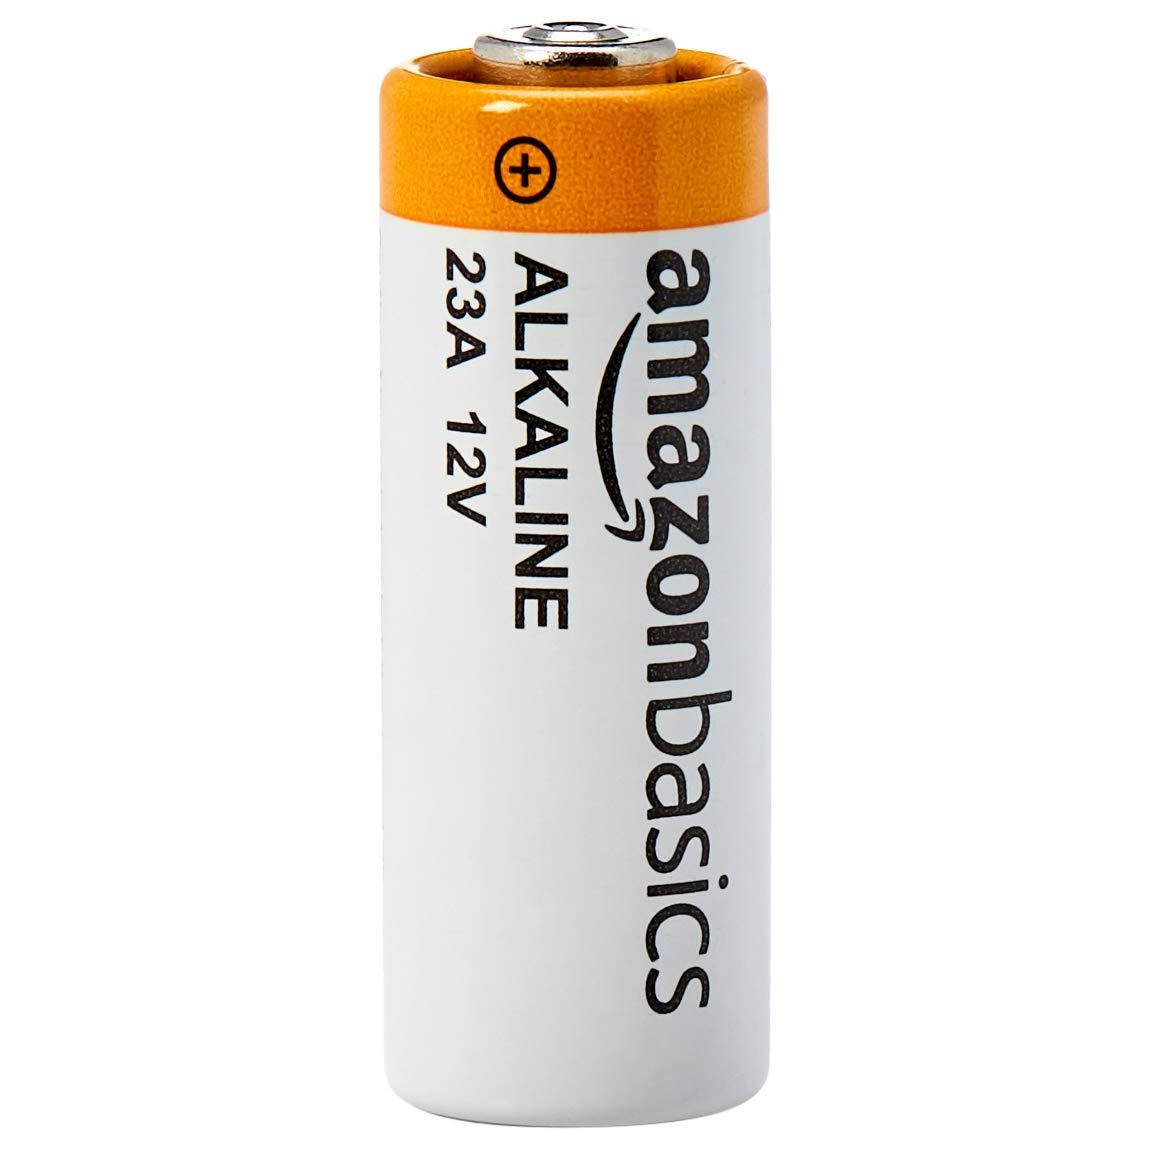 AmazonBasics A23 Alkaline Batteries (4-Pack)